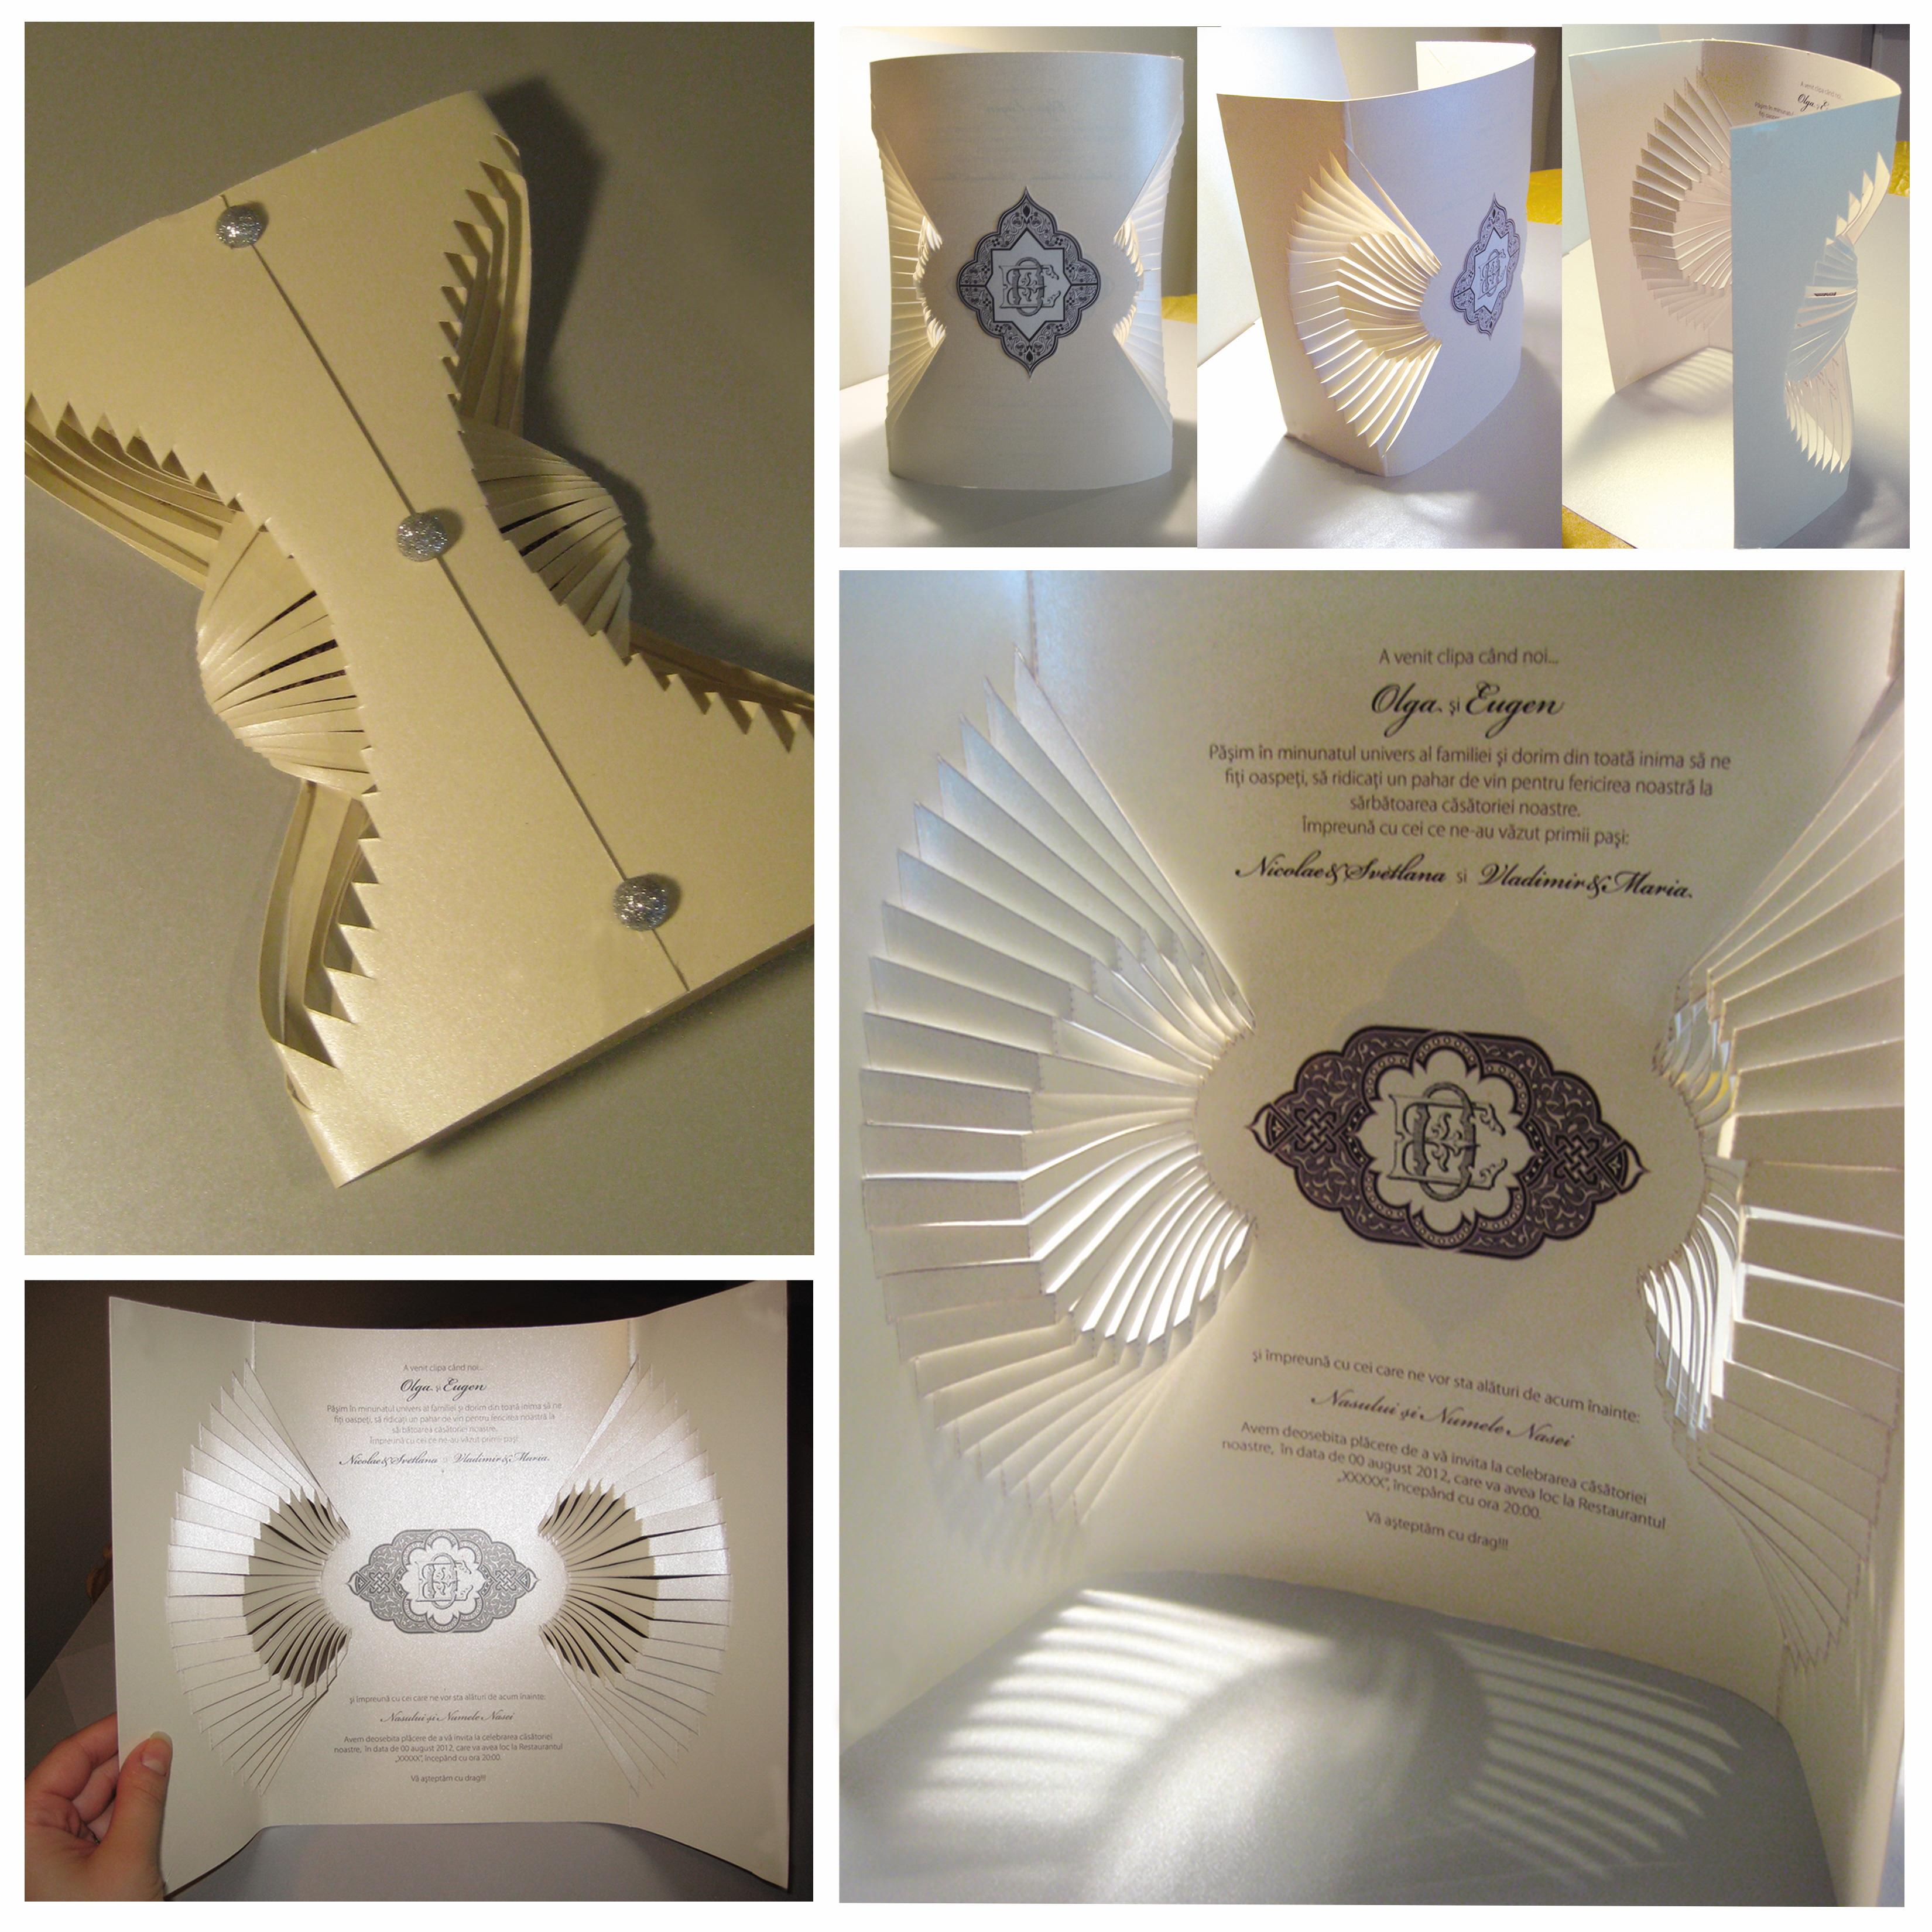 Creative Wedding Invitations. Paper Art. By Olga Cuzuioc